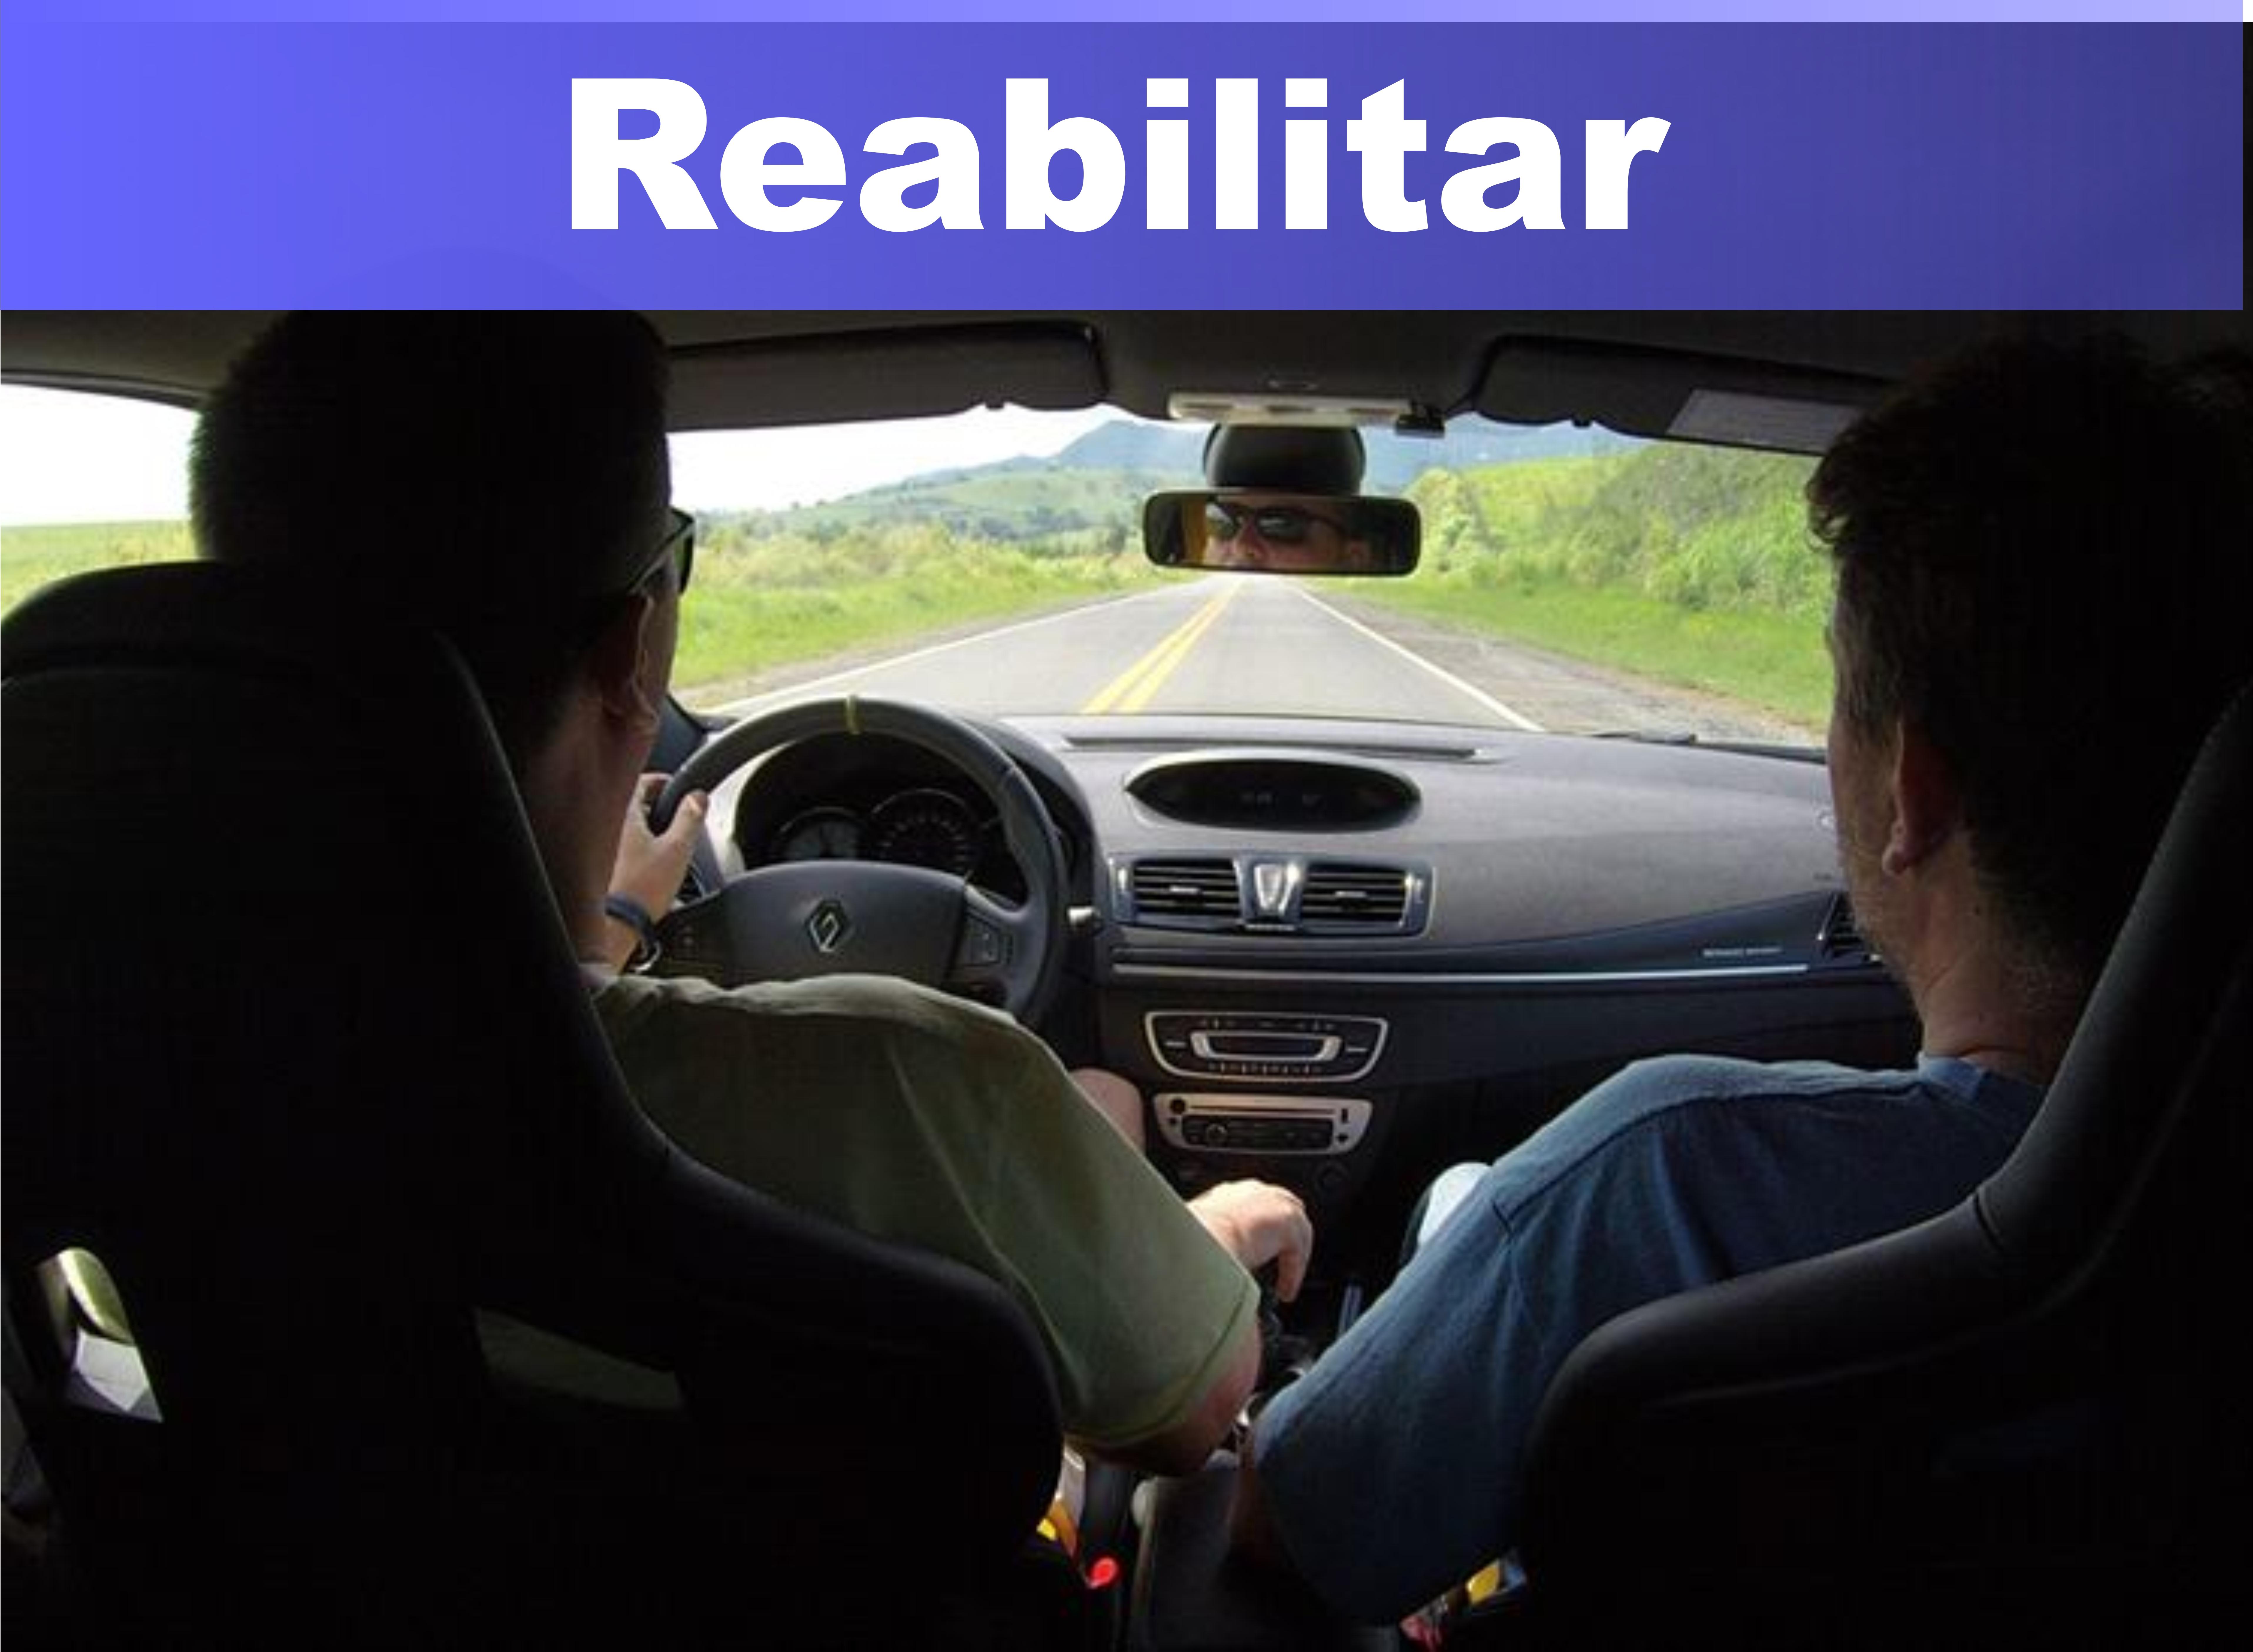 medo-dirigir-reabilitar